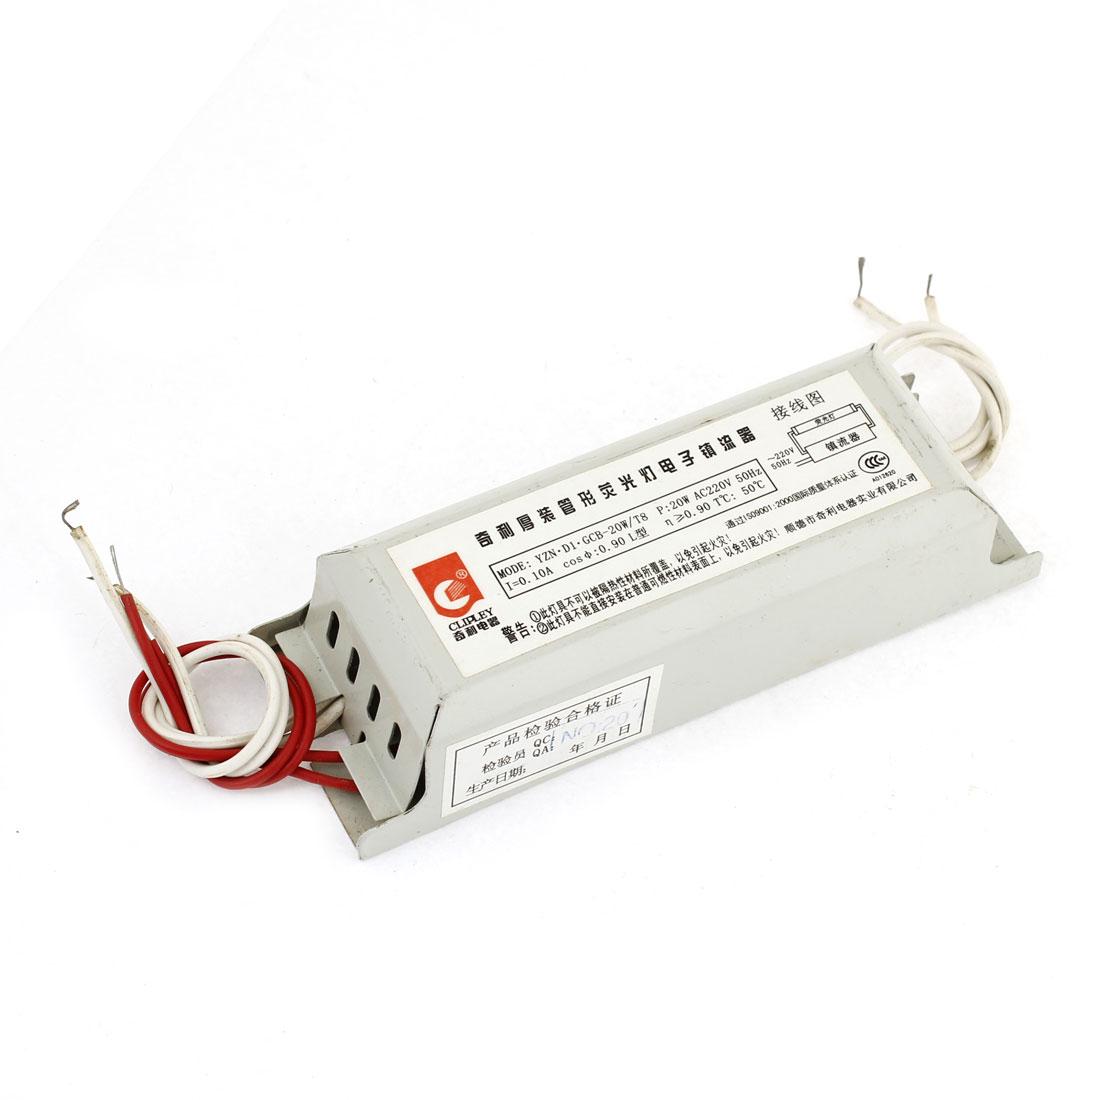 AC 220V 0.1A 20W 50Hz Gray Alloy Shell Fluorescent Light Lamp Ballast